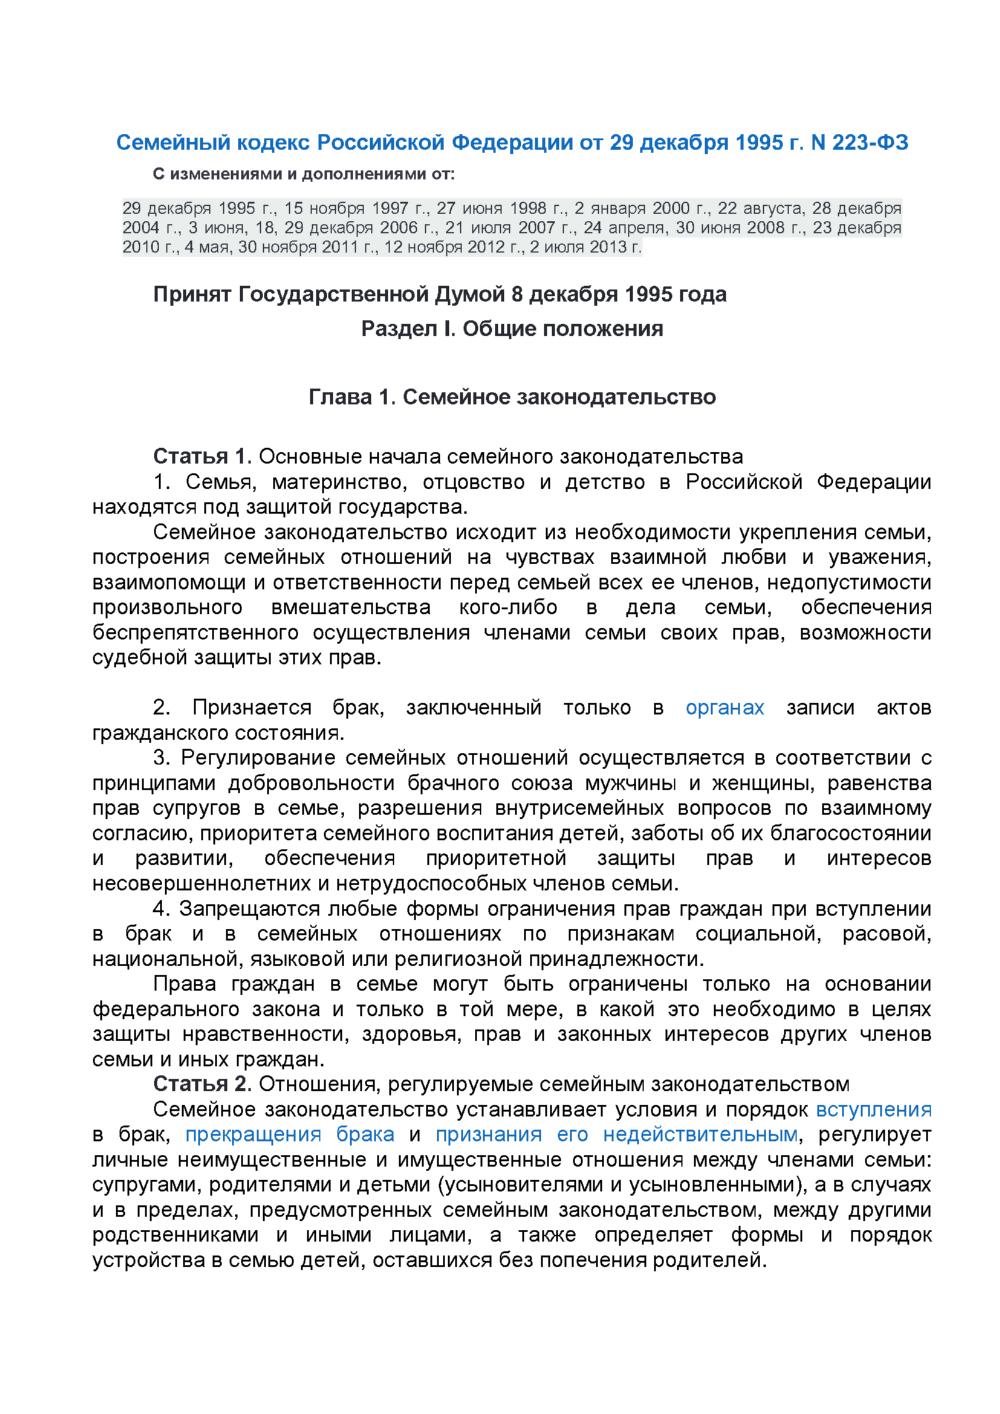 http://i1.imageban.ru/out/2013/11/04/b5e0a5ab1021b7349f00763026fceabd.jpg